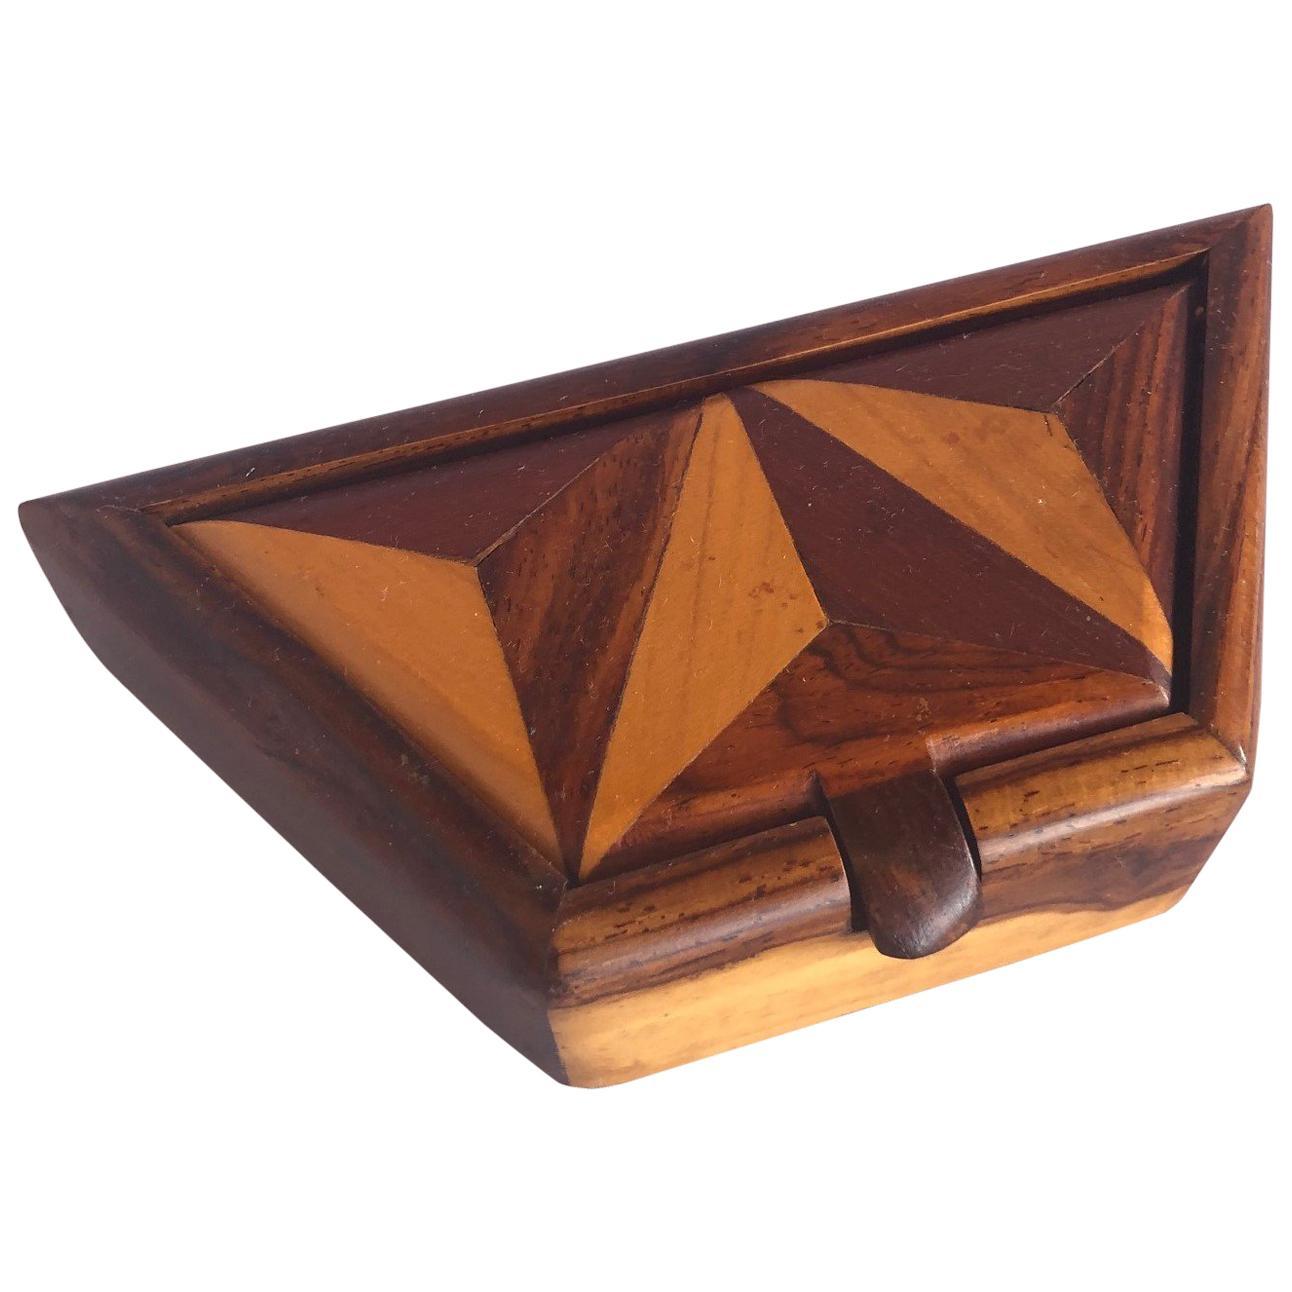 Inlaid Mixed Woods Trinket Box